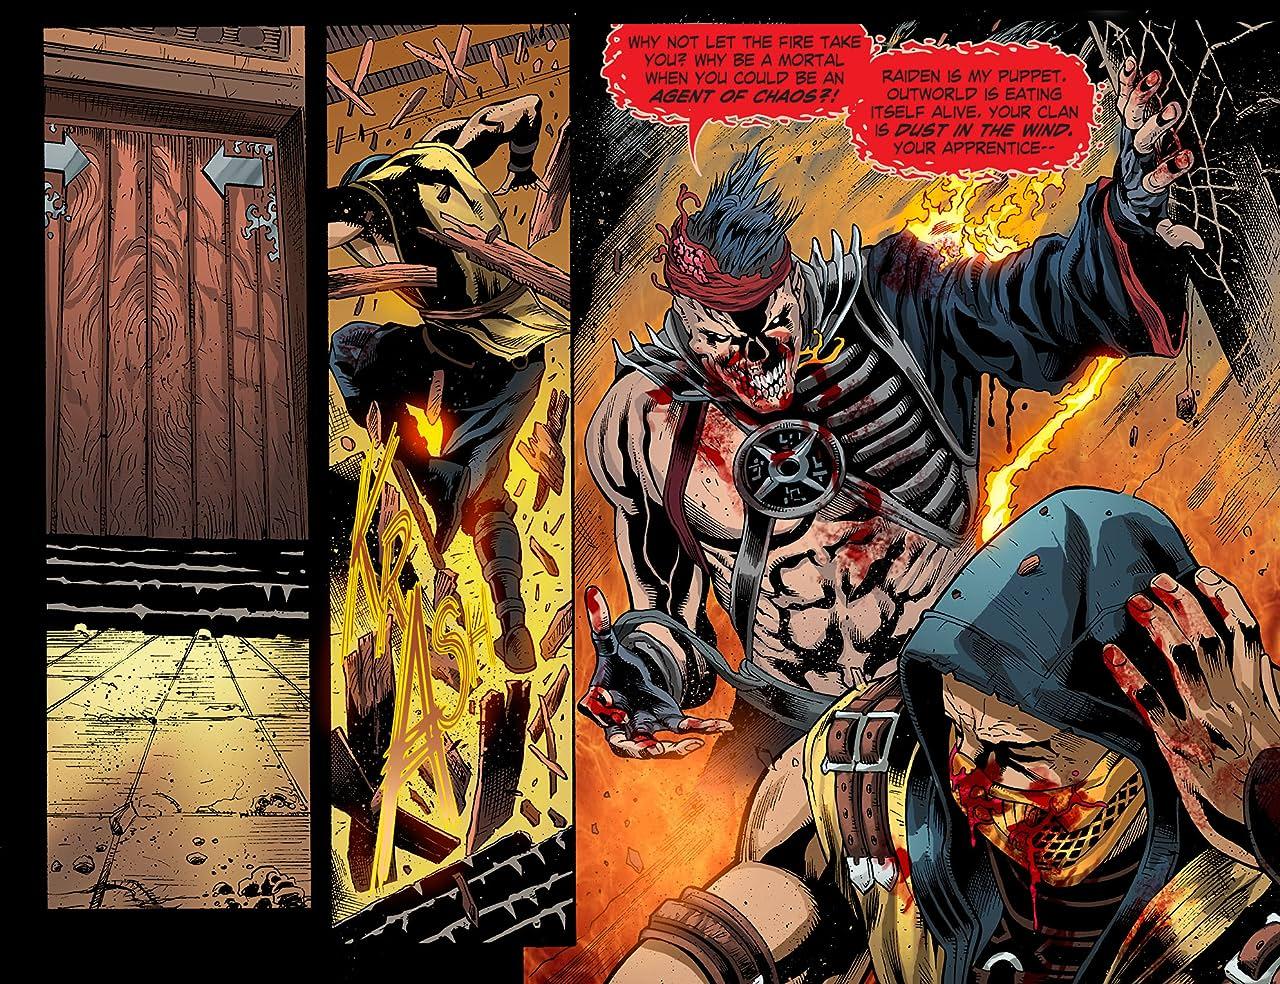 Mortal Kombat X (2015) #24